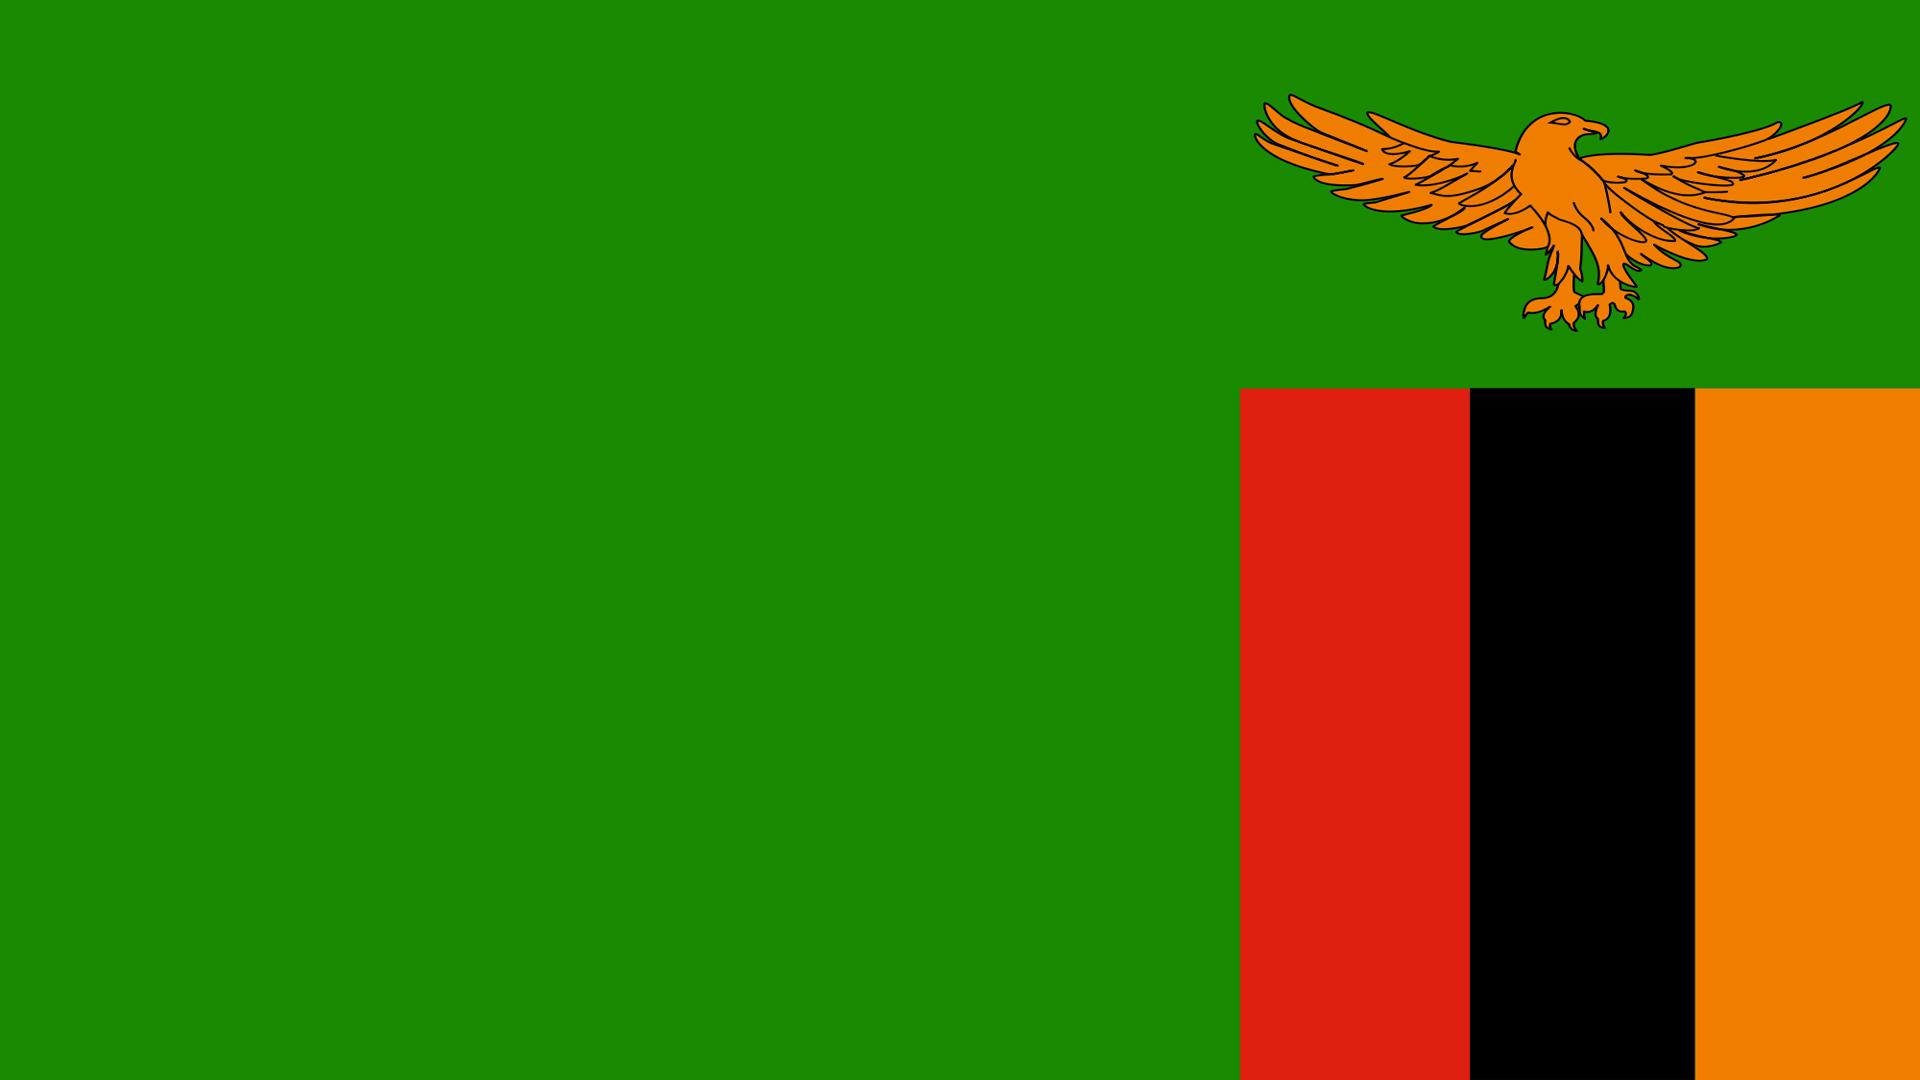 Zambia Flag   Wallpaper High Definition High Quality Widescreen 1920x1080